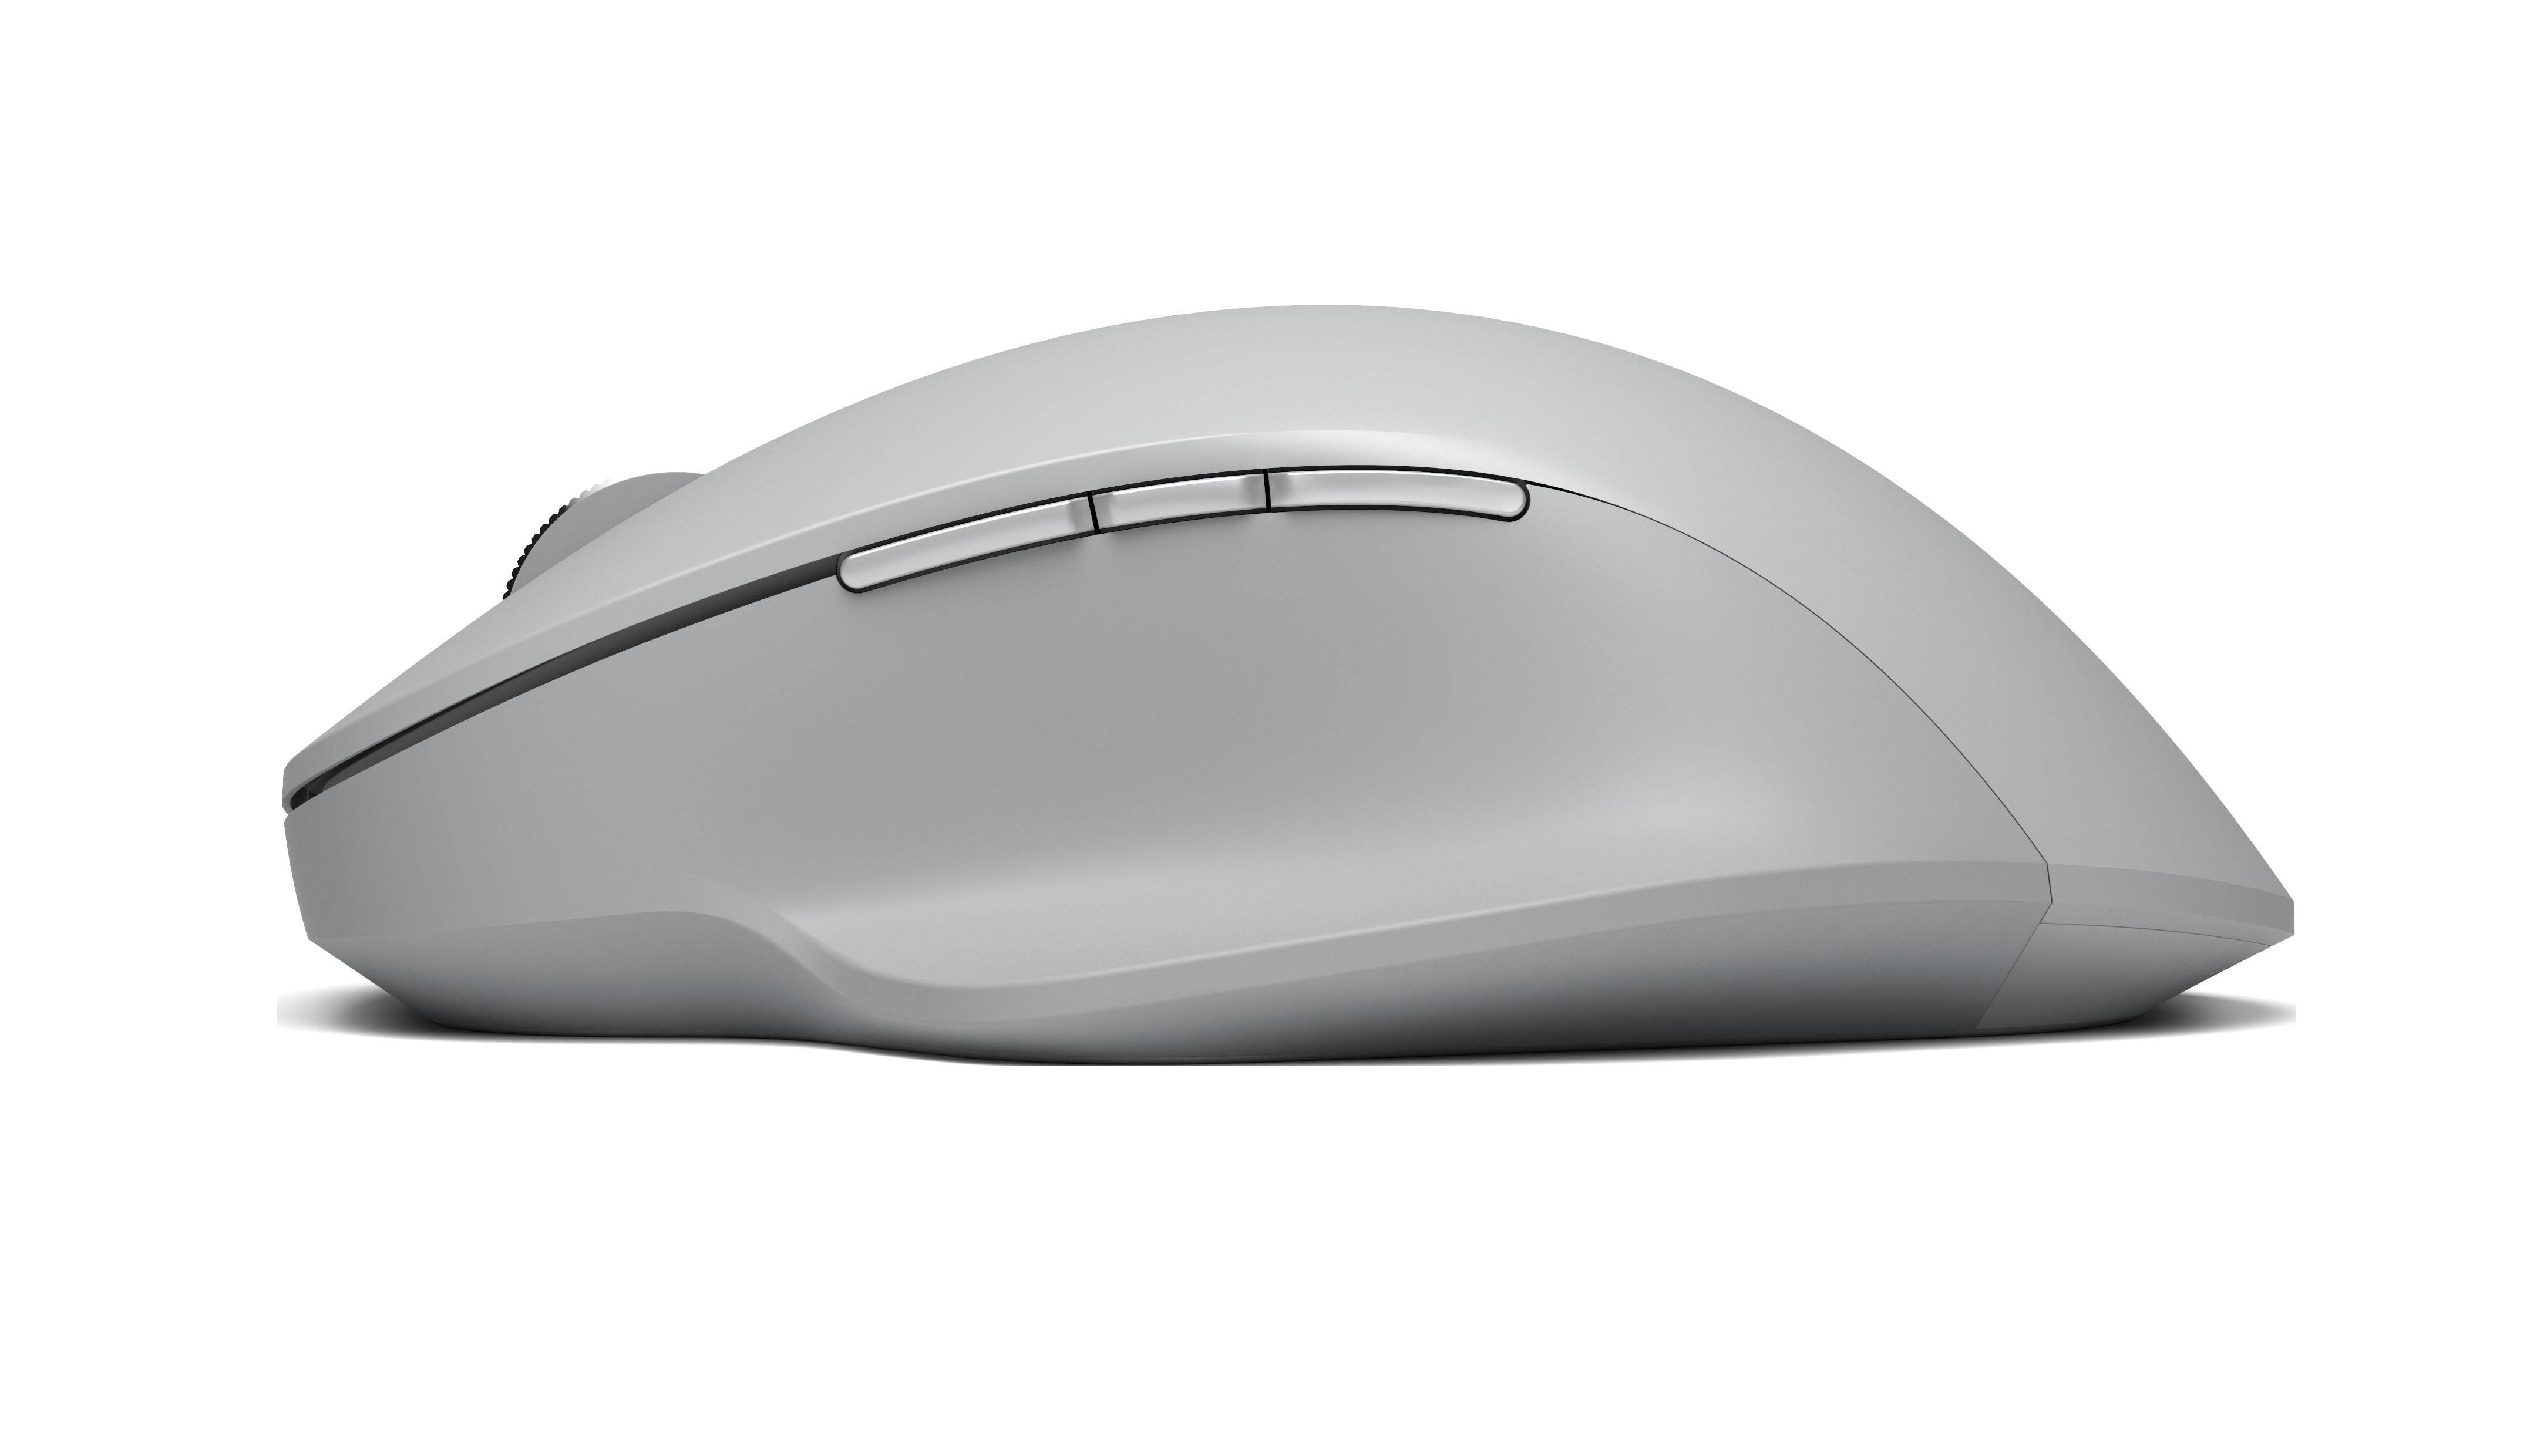 Microsoft анонсировала новые мыши IntelliMouse иSurface Precision Mouse